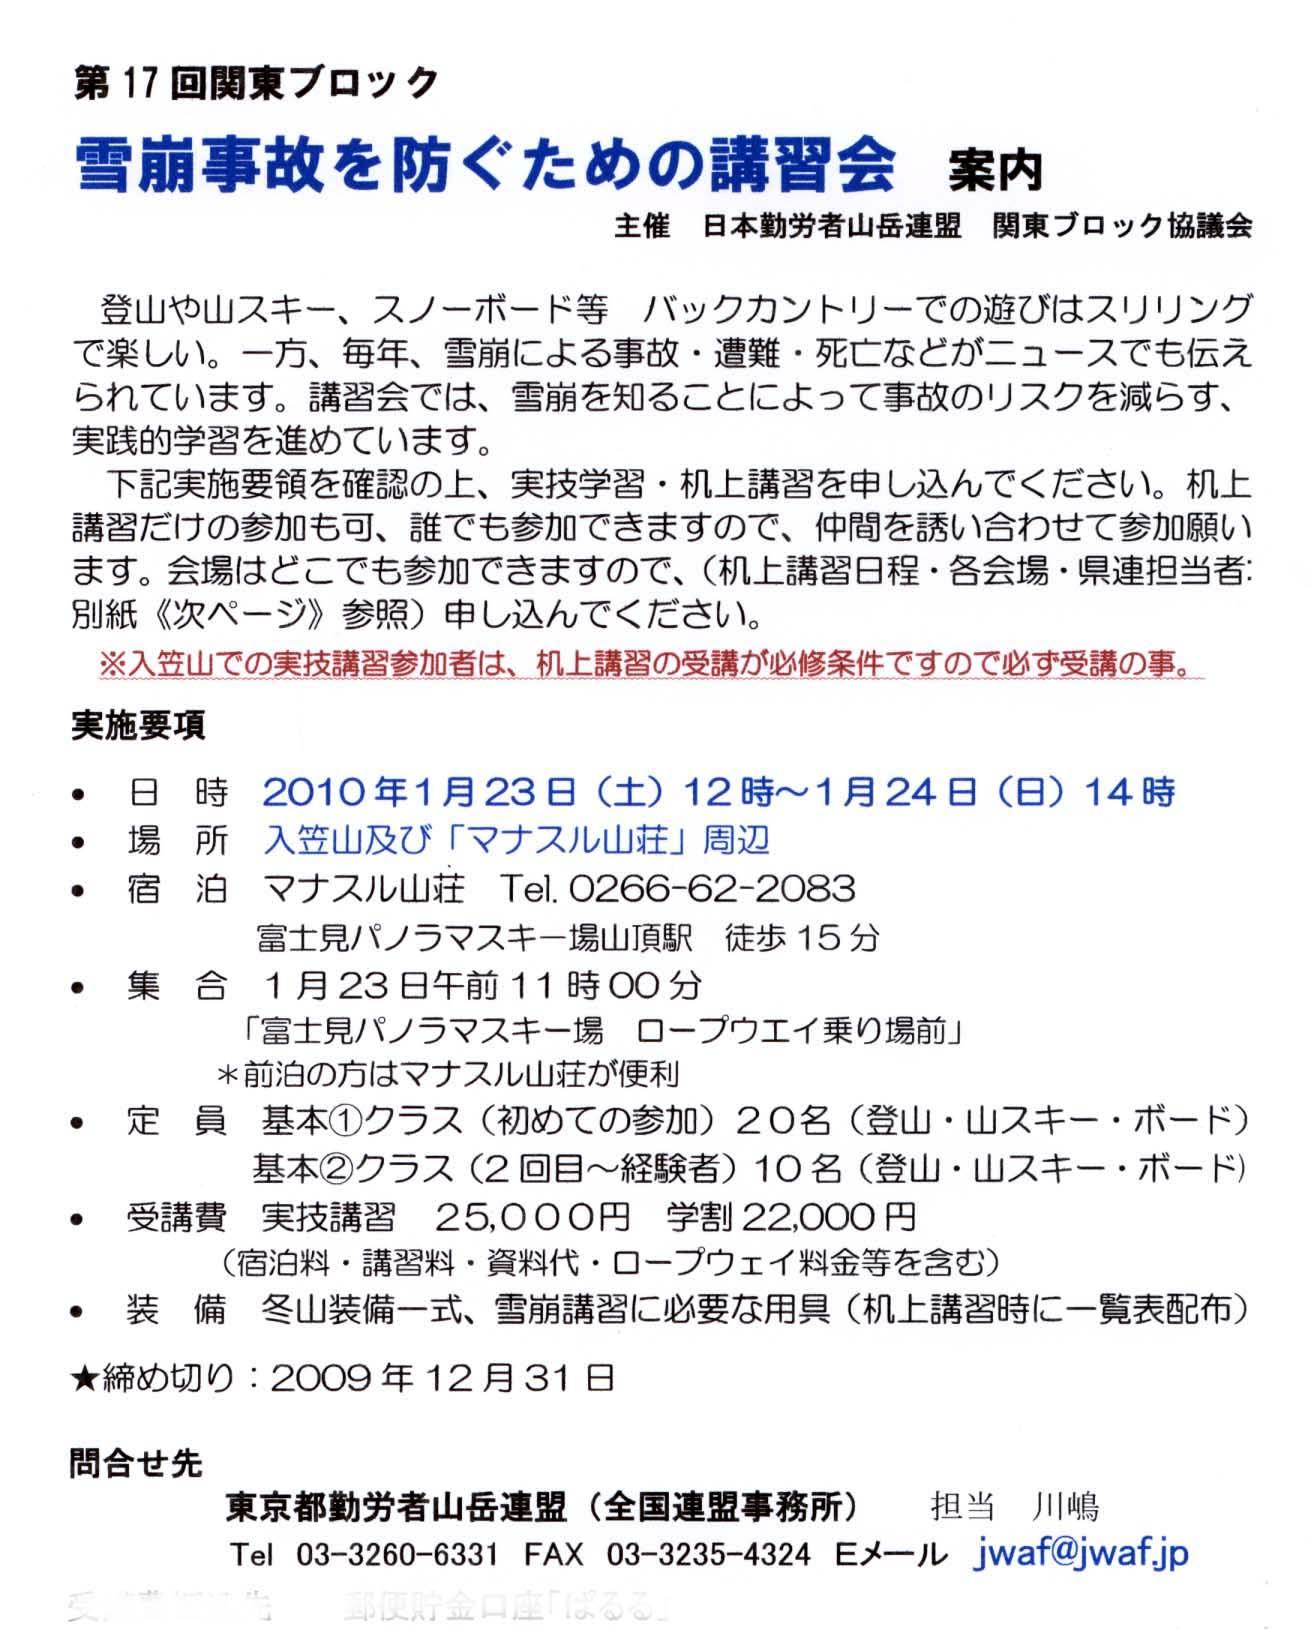 第17回関東ブロック雪崩講習会案内①